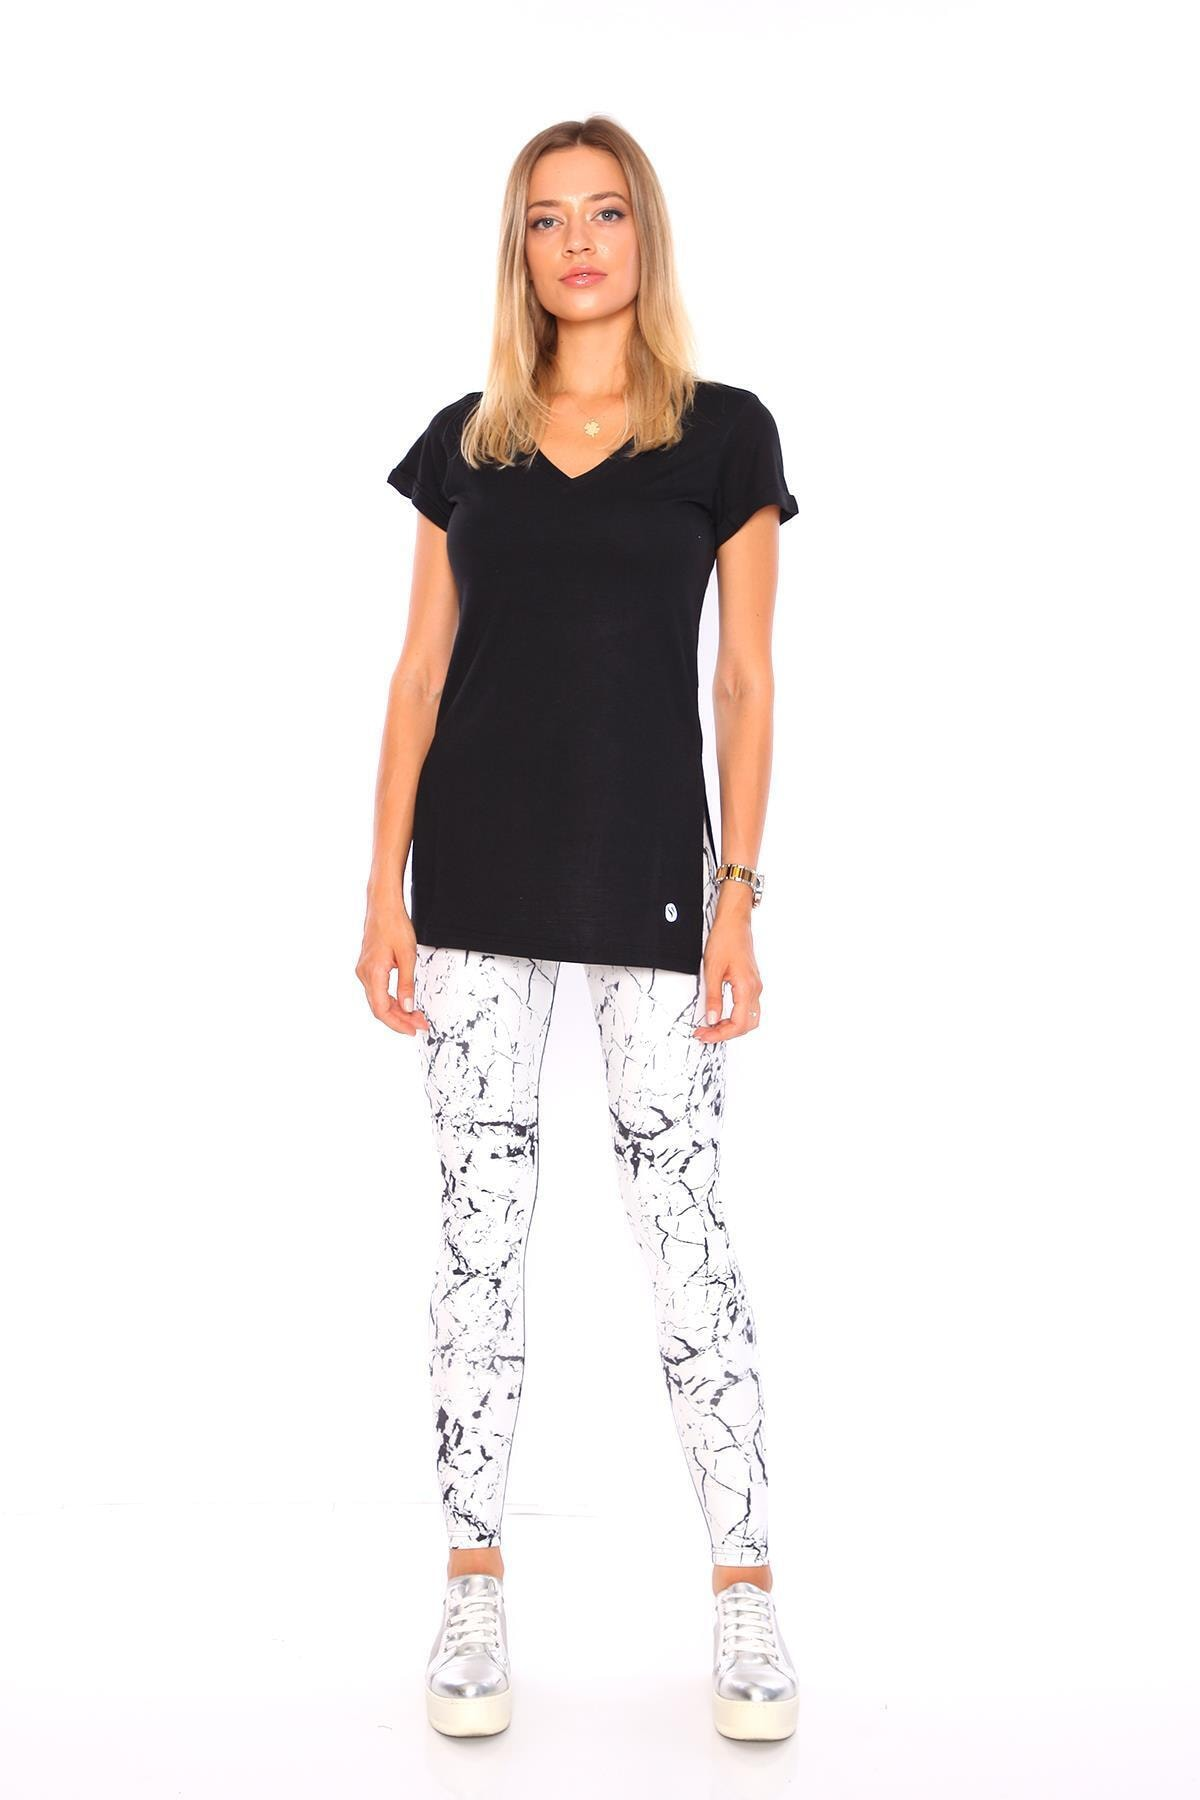 Superstacy Kadın Siyah V Yaka Yırtmaçlı Tunik Kadın Tshirt 2